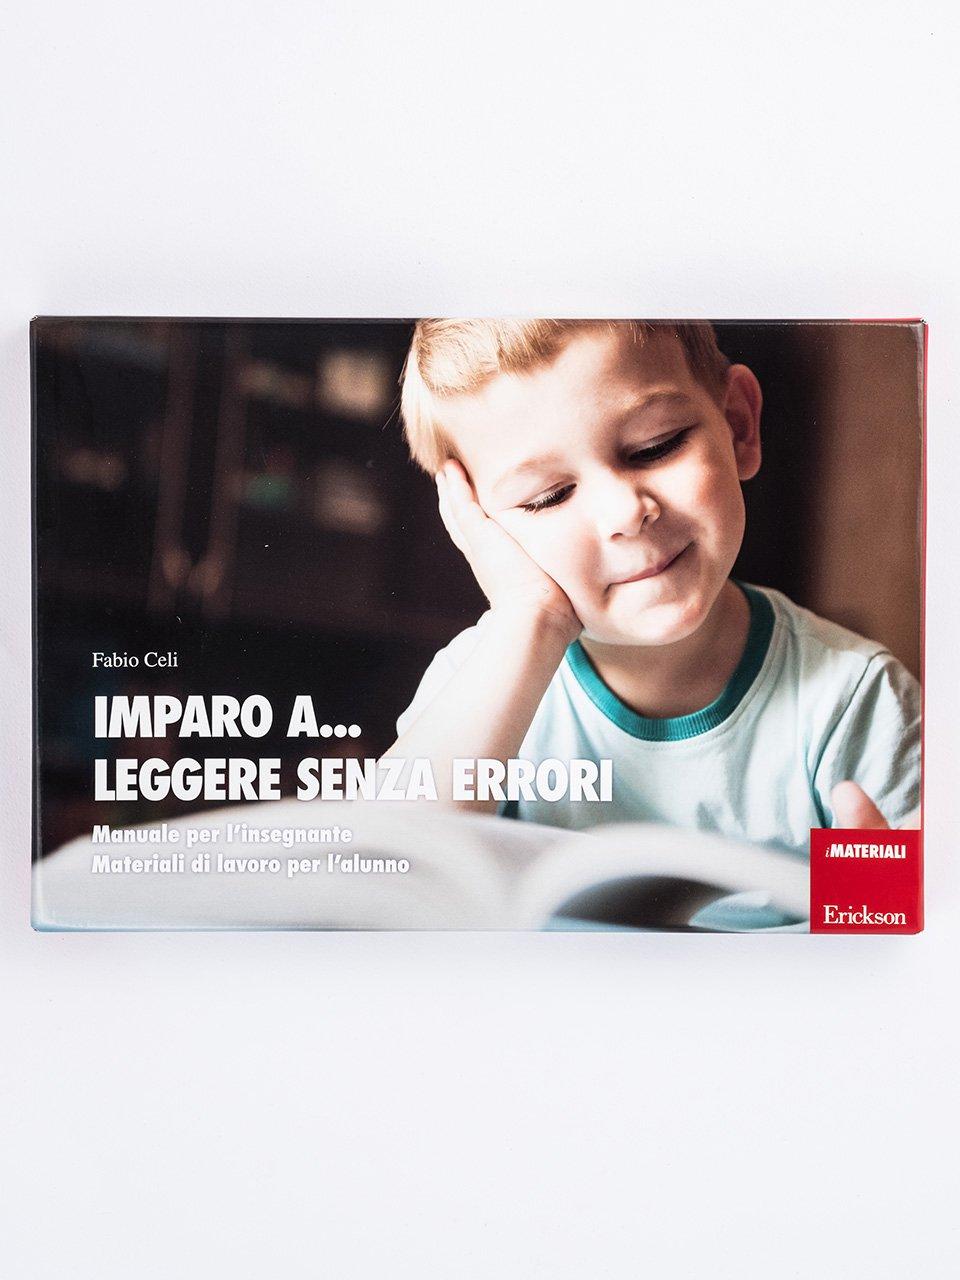 Imparo a... leggere senza errori - Leggere testi - Libri - App e software - Erickson